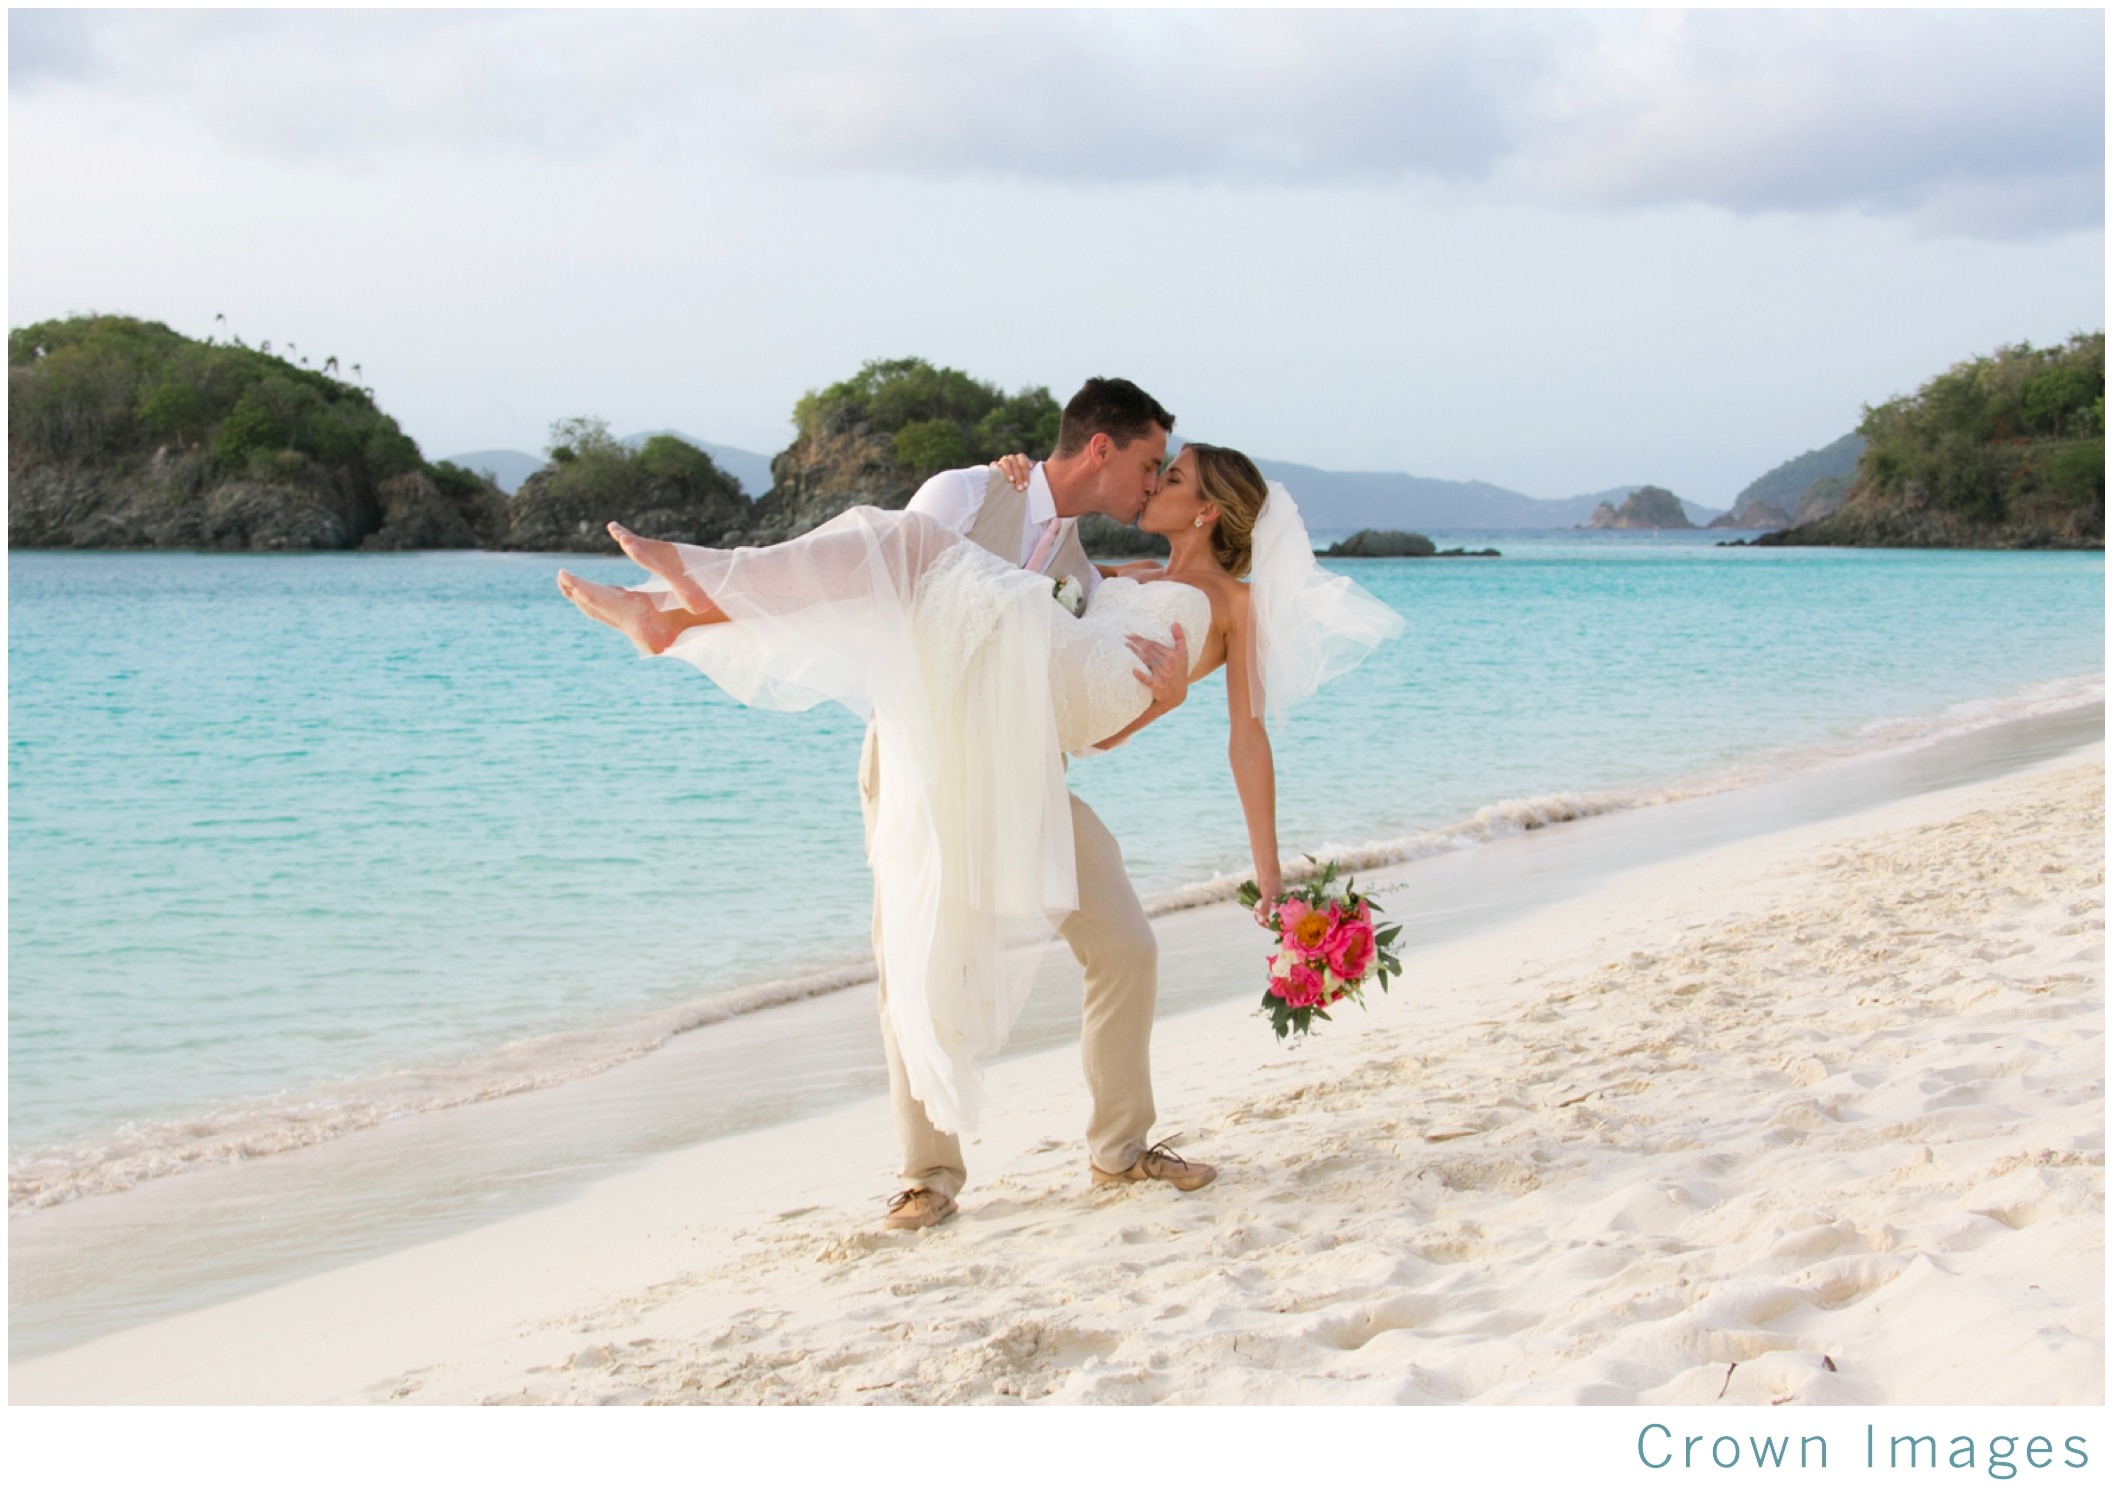 wedding photos crown images_1667.jpg